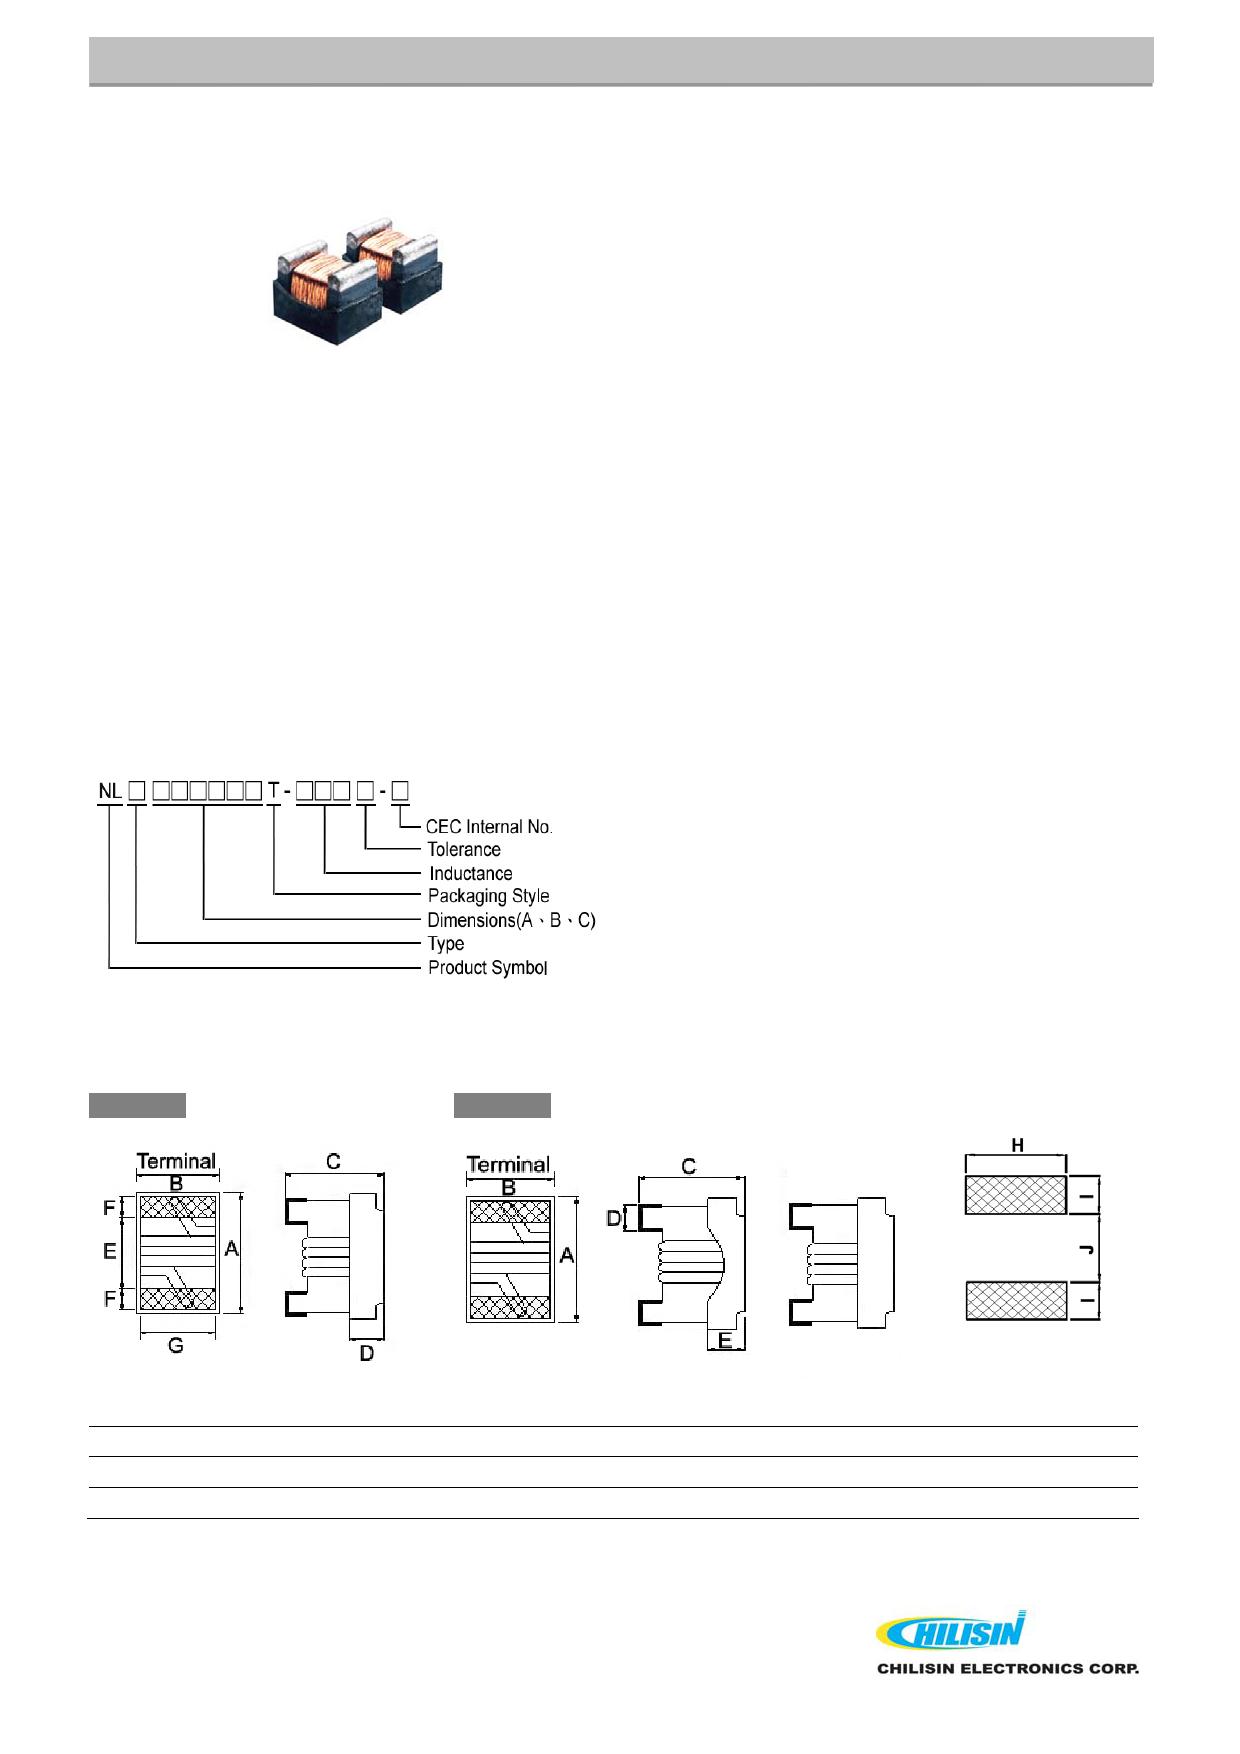 NL252018T 데이터시트 및 NL252018T PDF